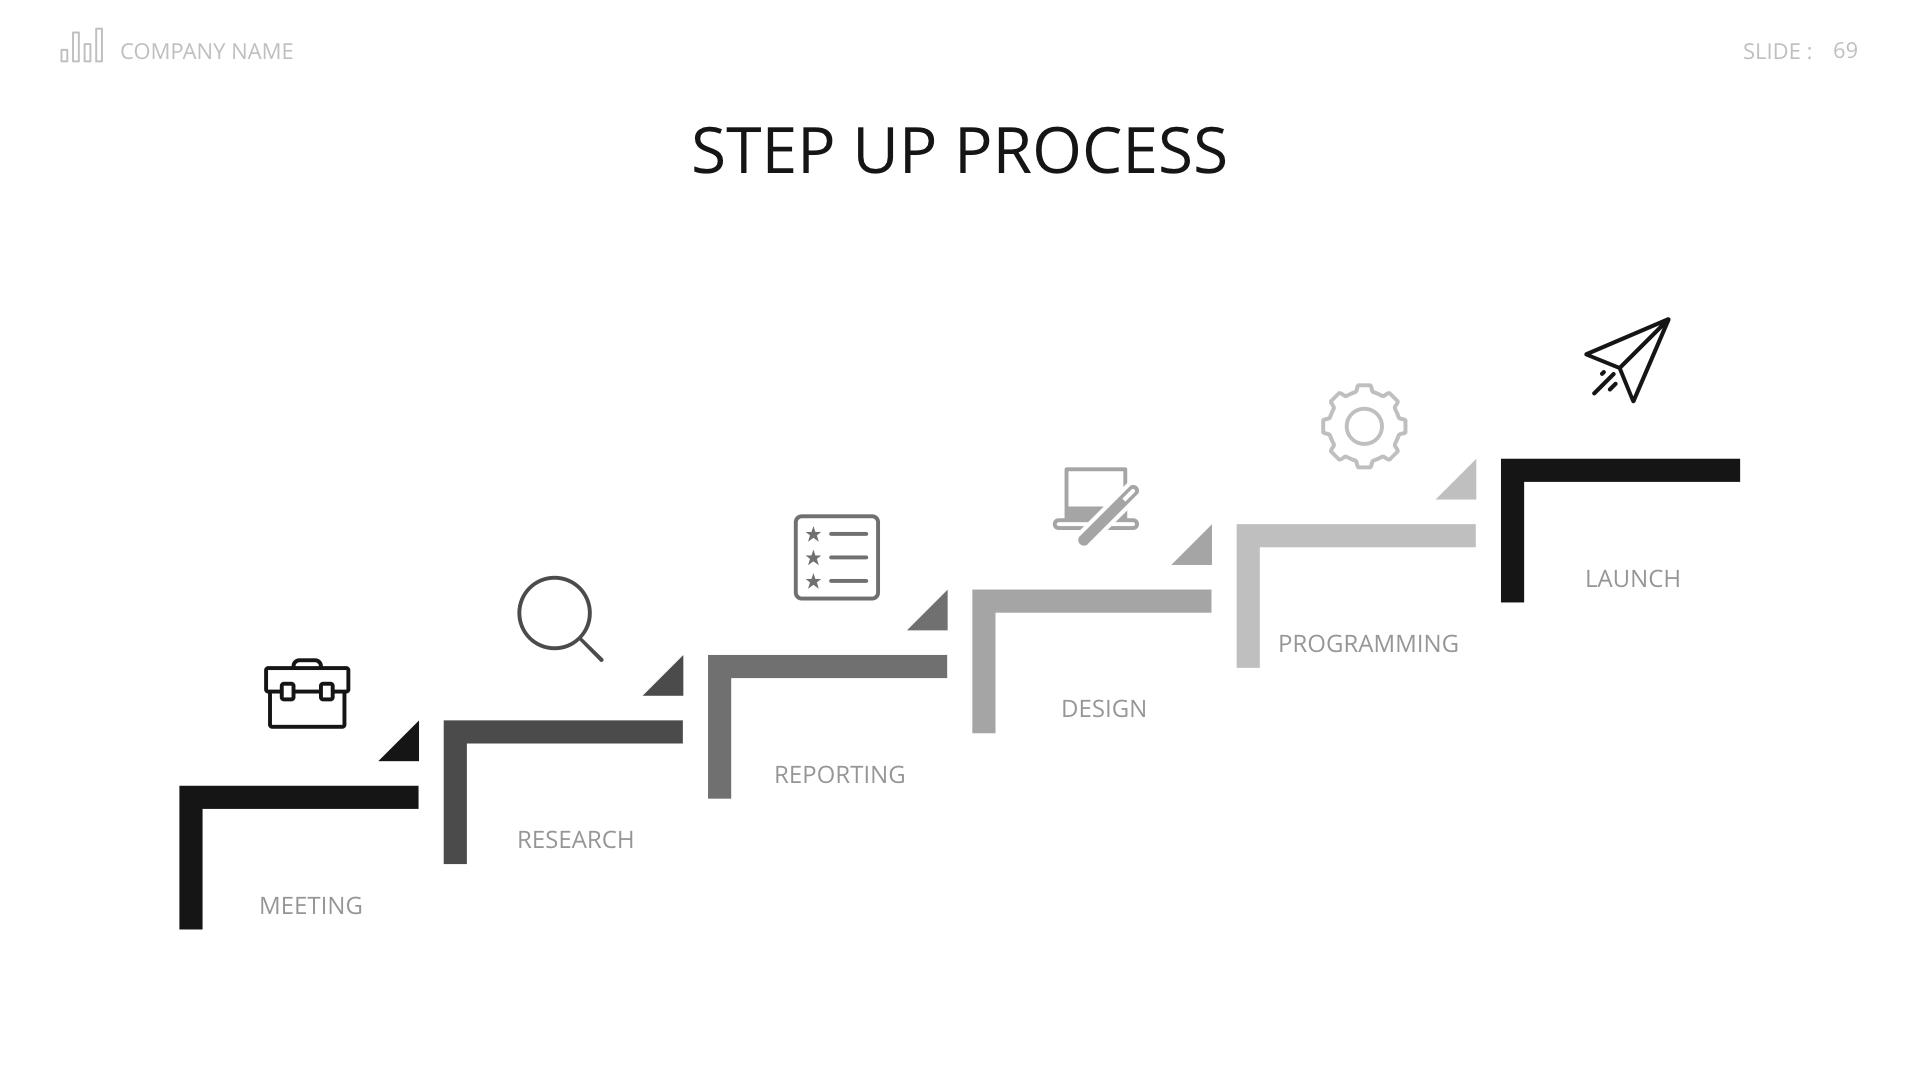 Startup Business Plan Keynote Presentation Template by